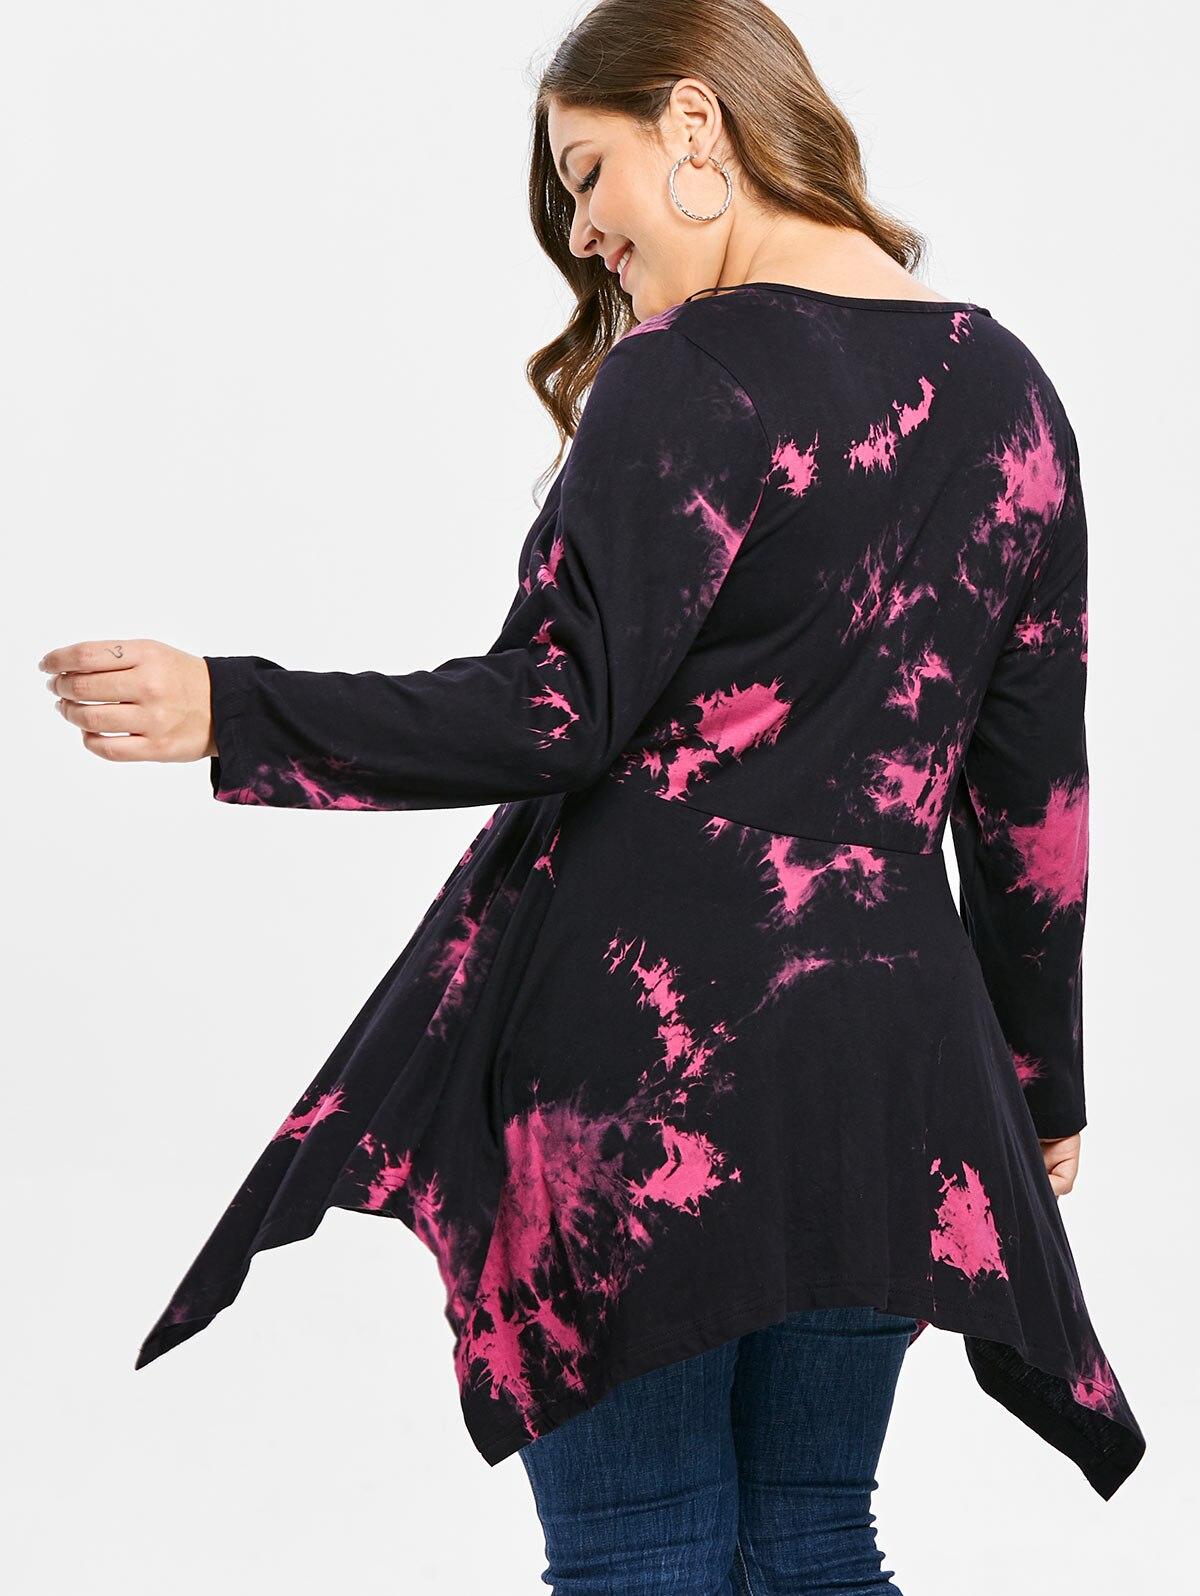 Wipalo Women Plus Size Cutout Tie Dye Handkerchief Tunic T Shirt Casual V  Neck Long Leeves Asymmetrical Tee 5XL Big Size Tops-in T-Shirts from Women s  ... 17dd17b9ca09